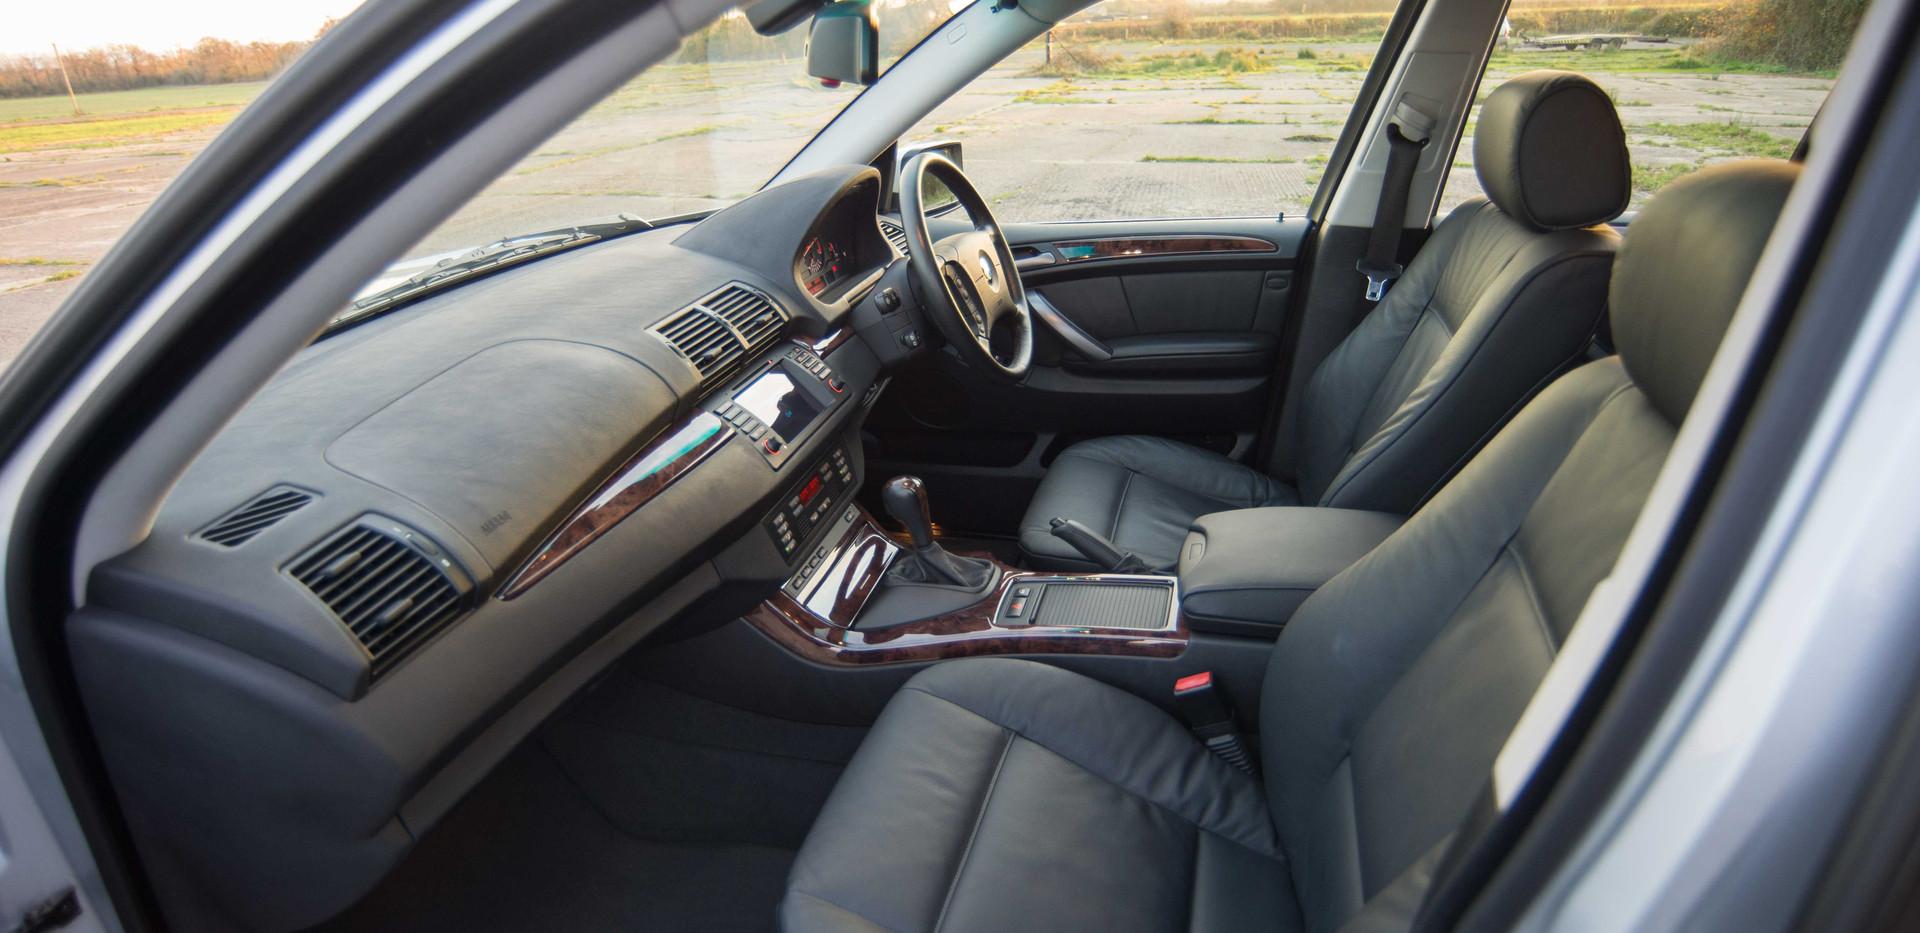 BMW E53 X5 4.4i For Sale UK London  (15